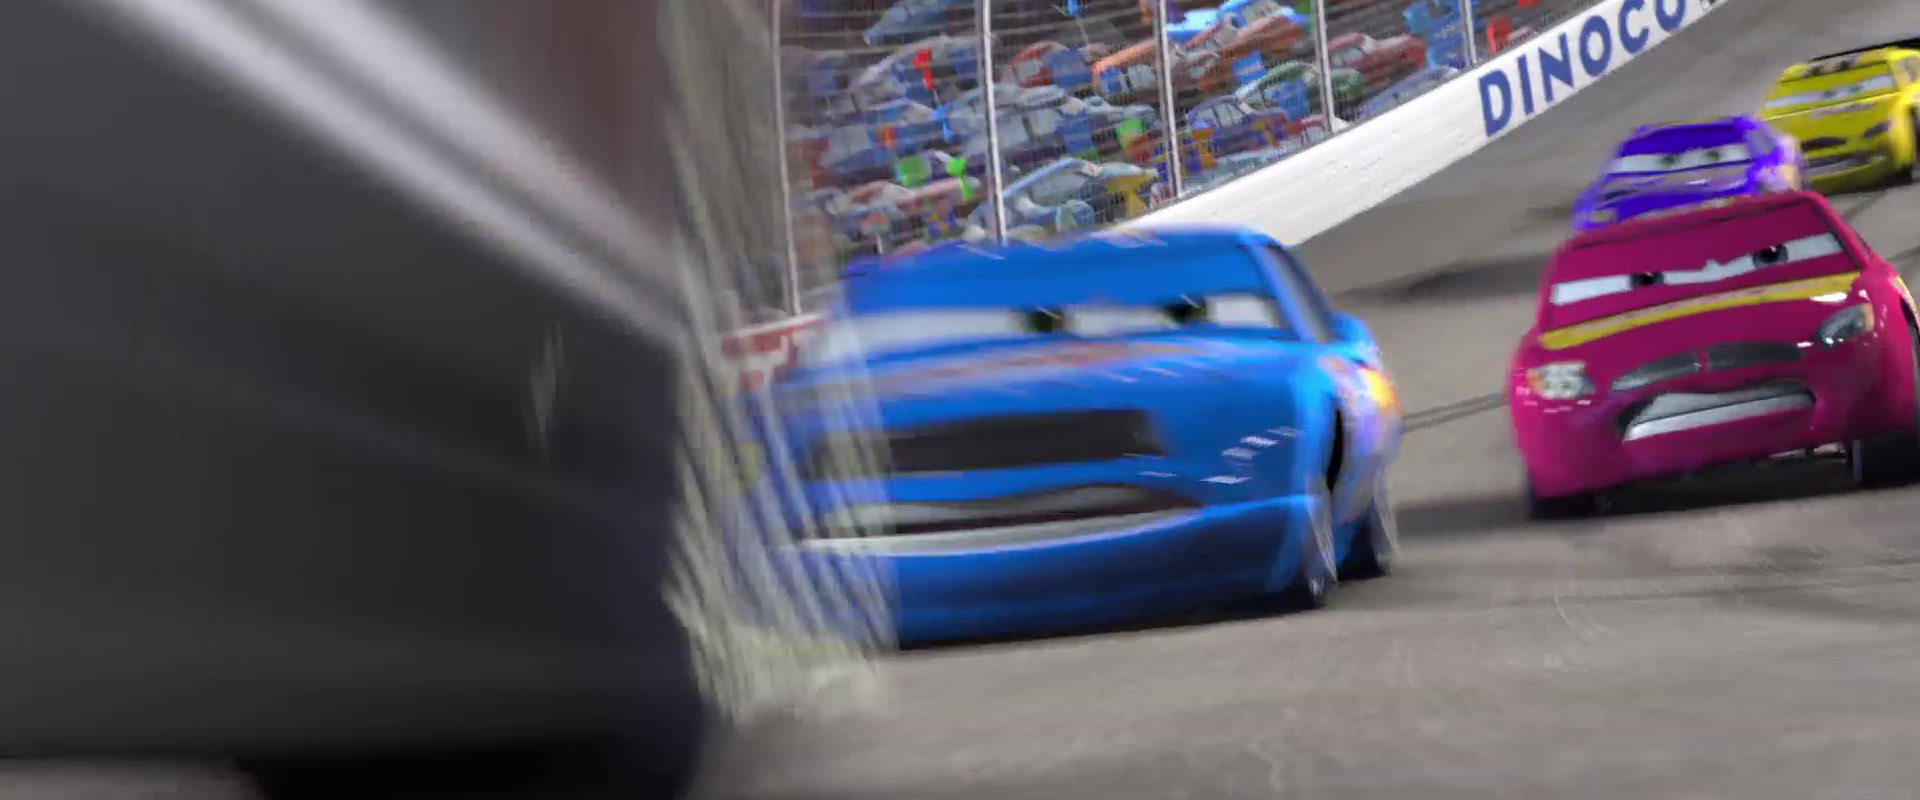 misti motorkrass personnage character pixar disney cars